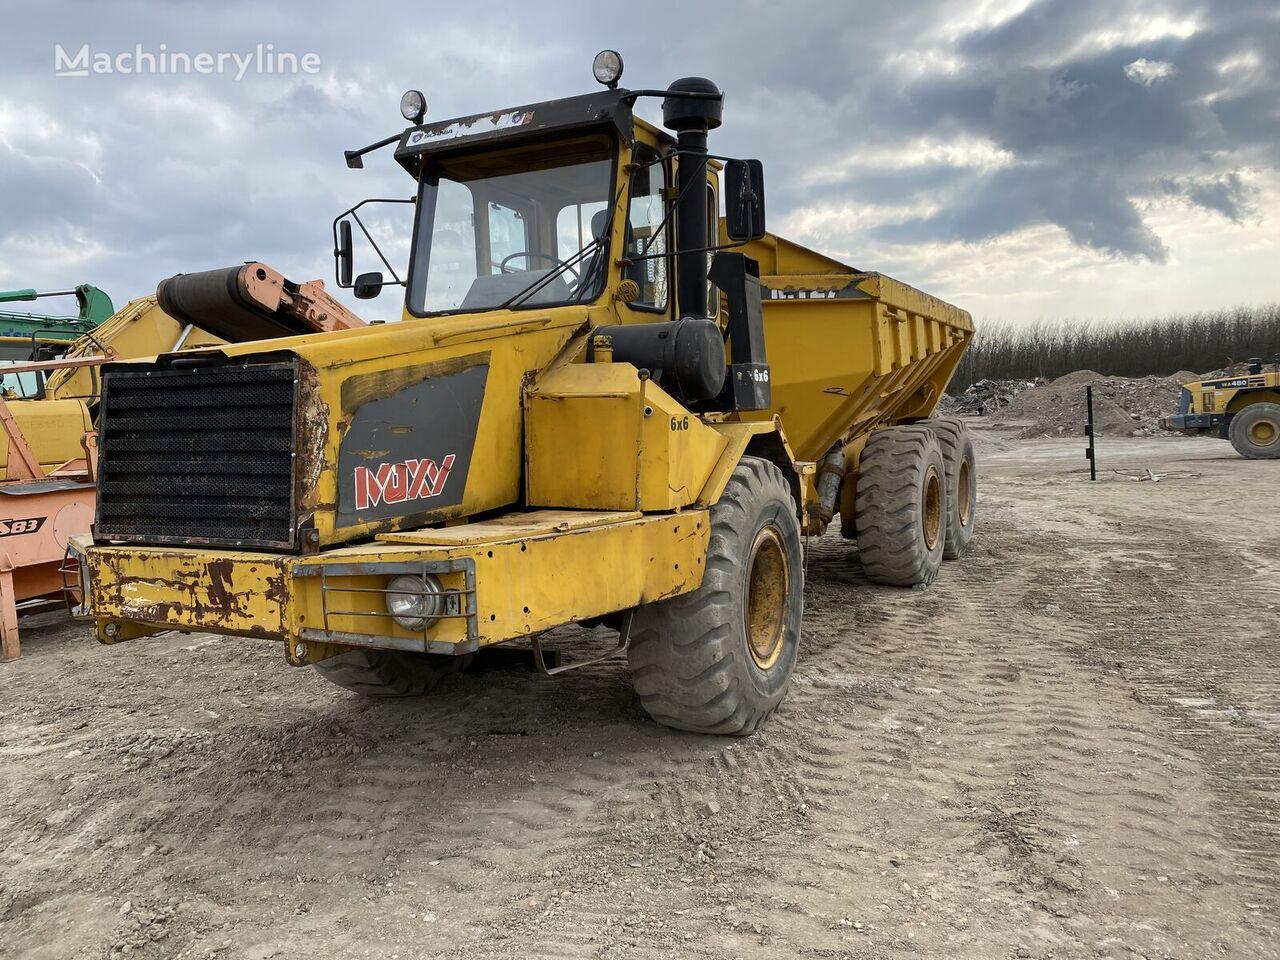 MOXY articulated dump truck